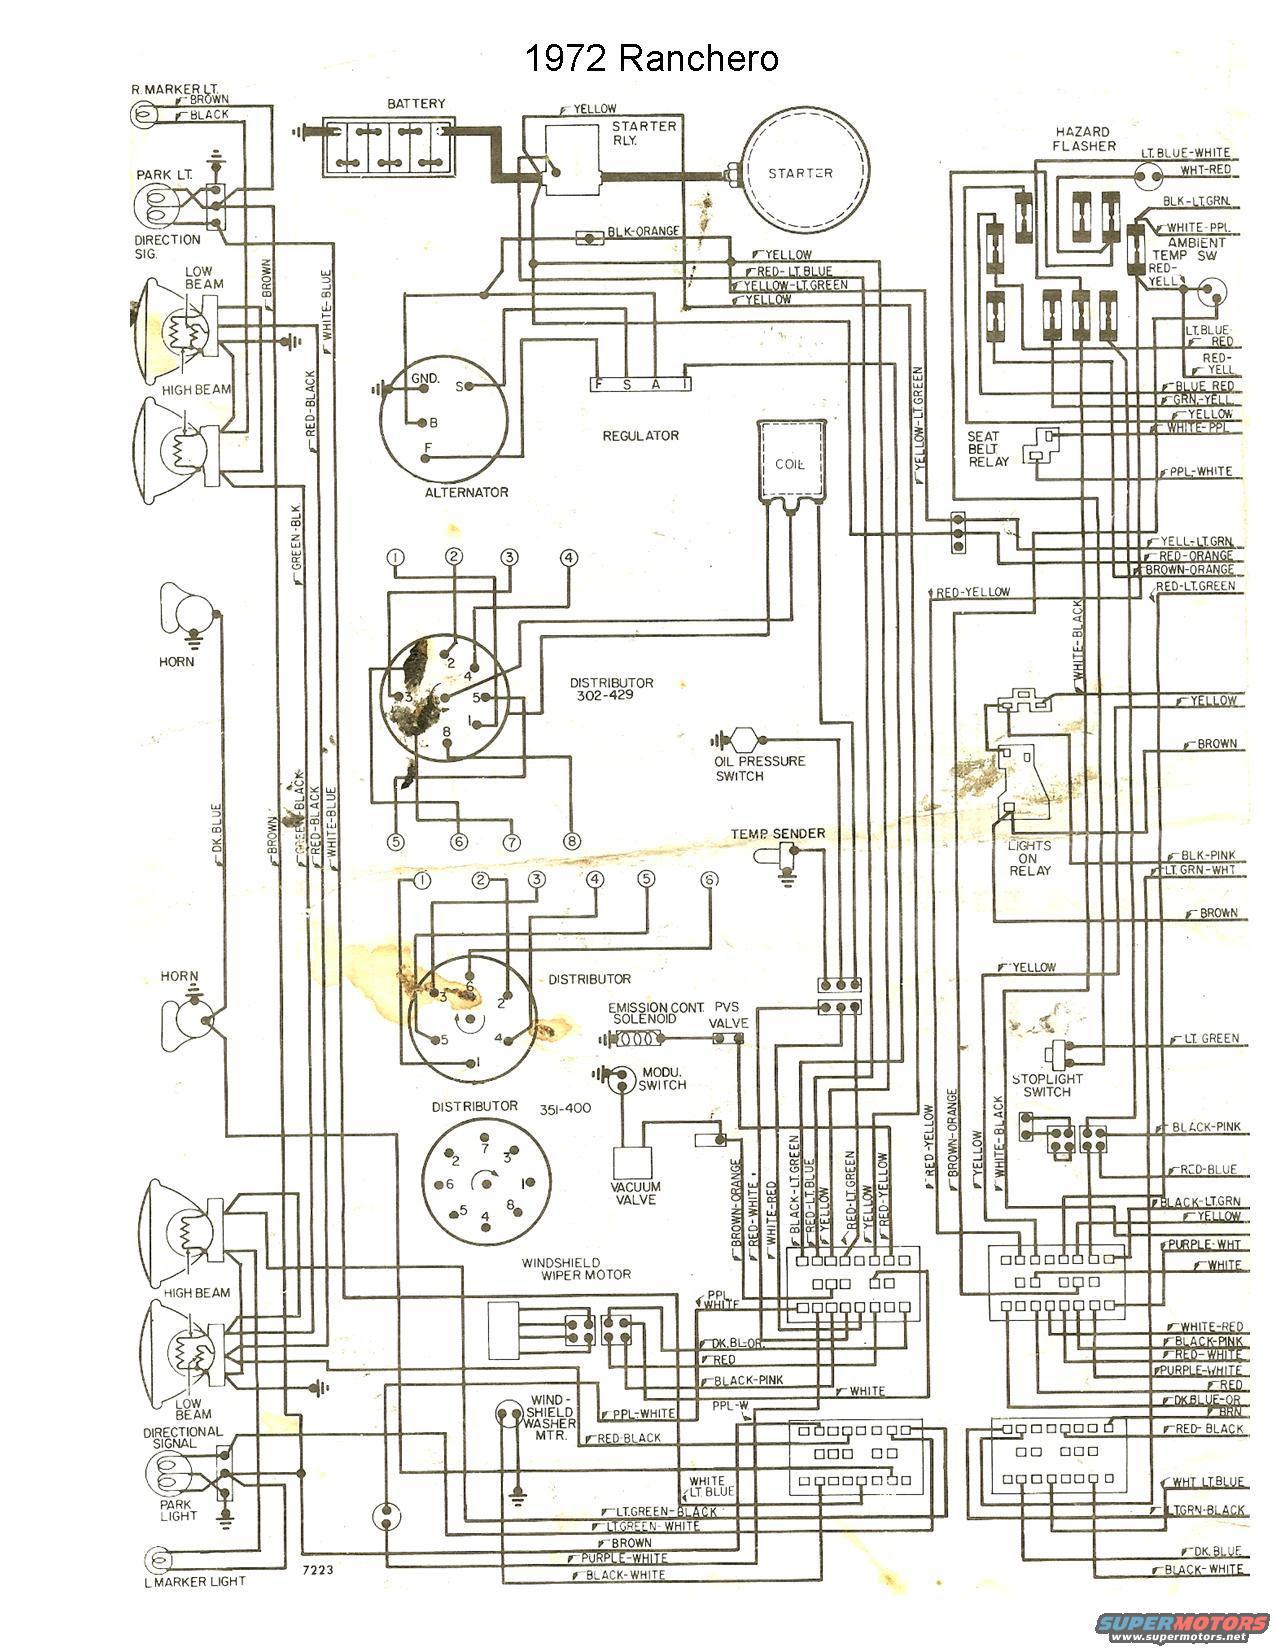 1969 Ford Torino Wiring Diagram Piaa Wiring Diagram Free Picture Schematic For Wiring Diagram Schematics